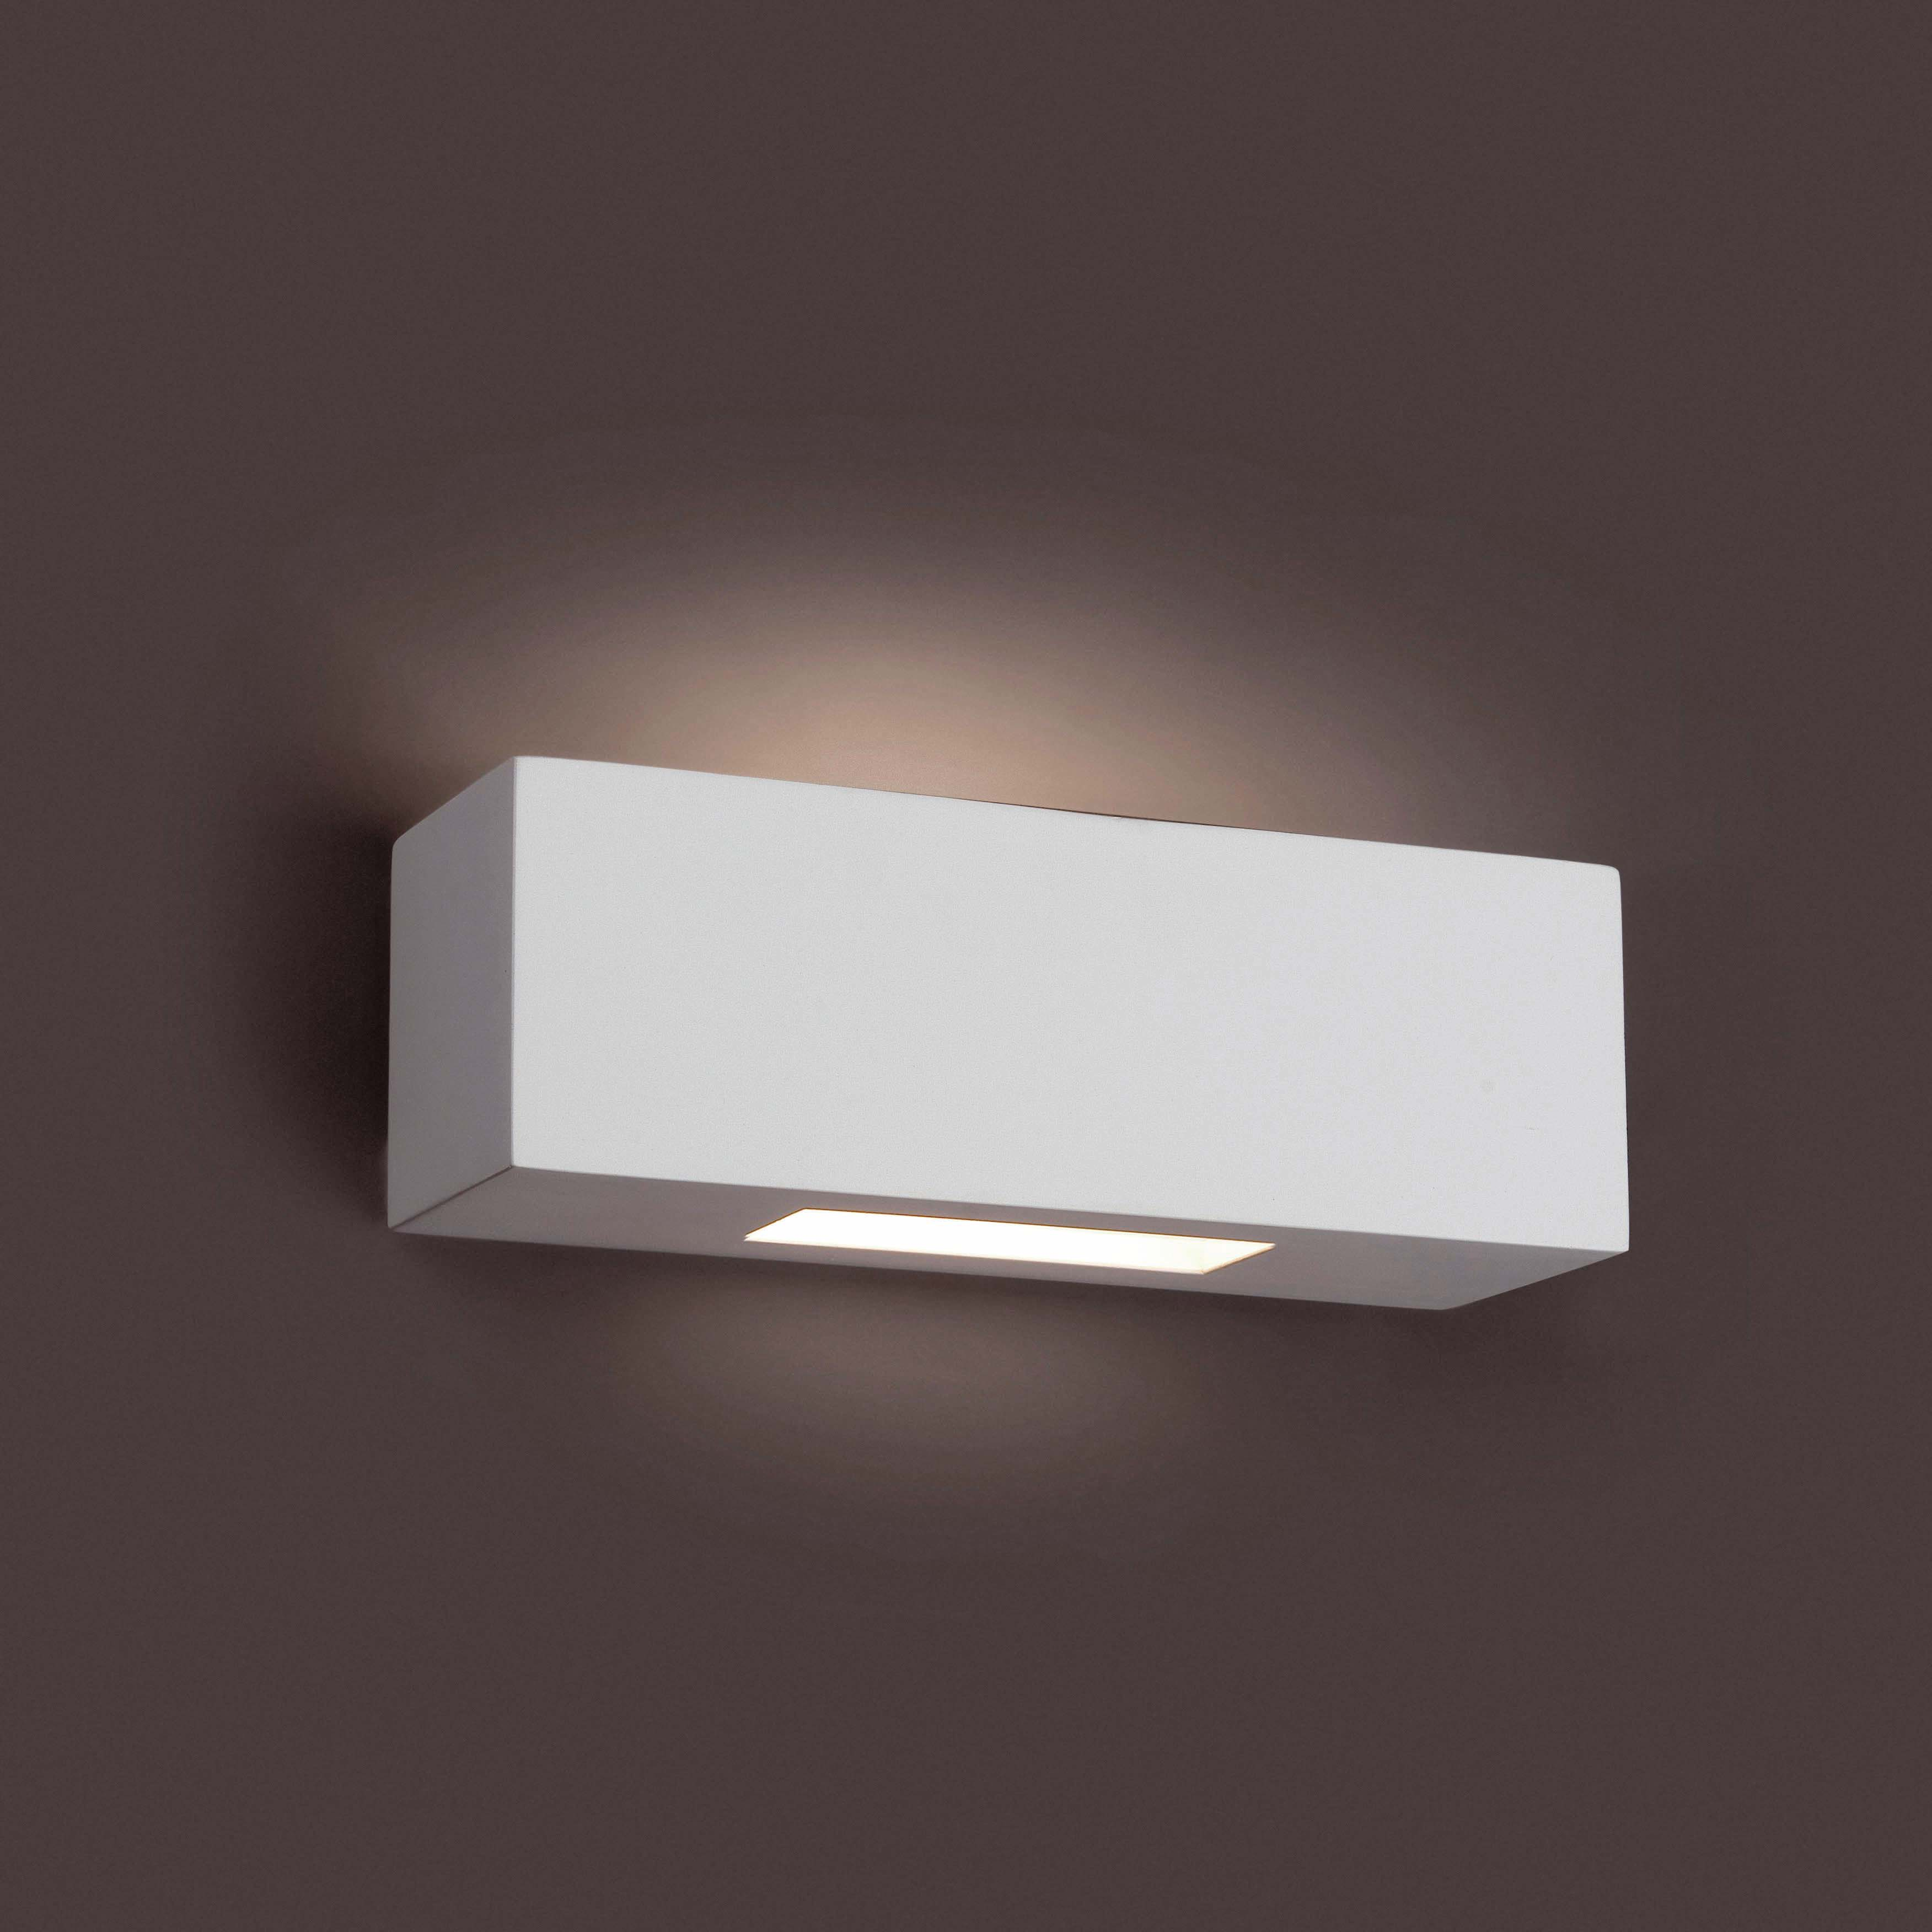 Cheras 3 Wall Lamp R7s JP78 100W White